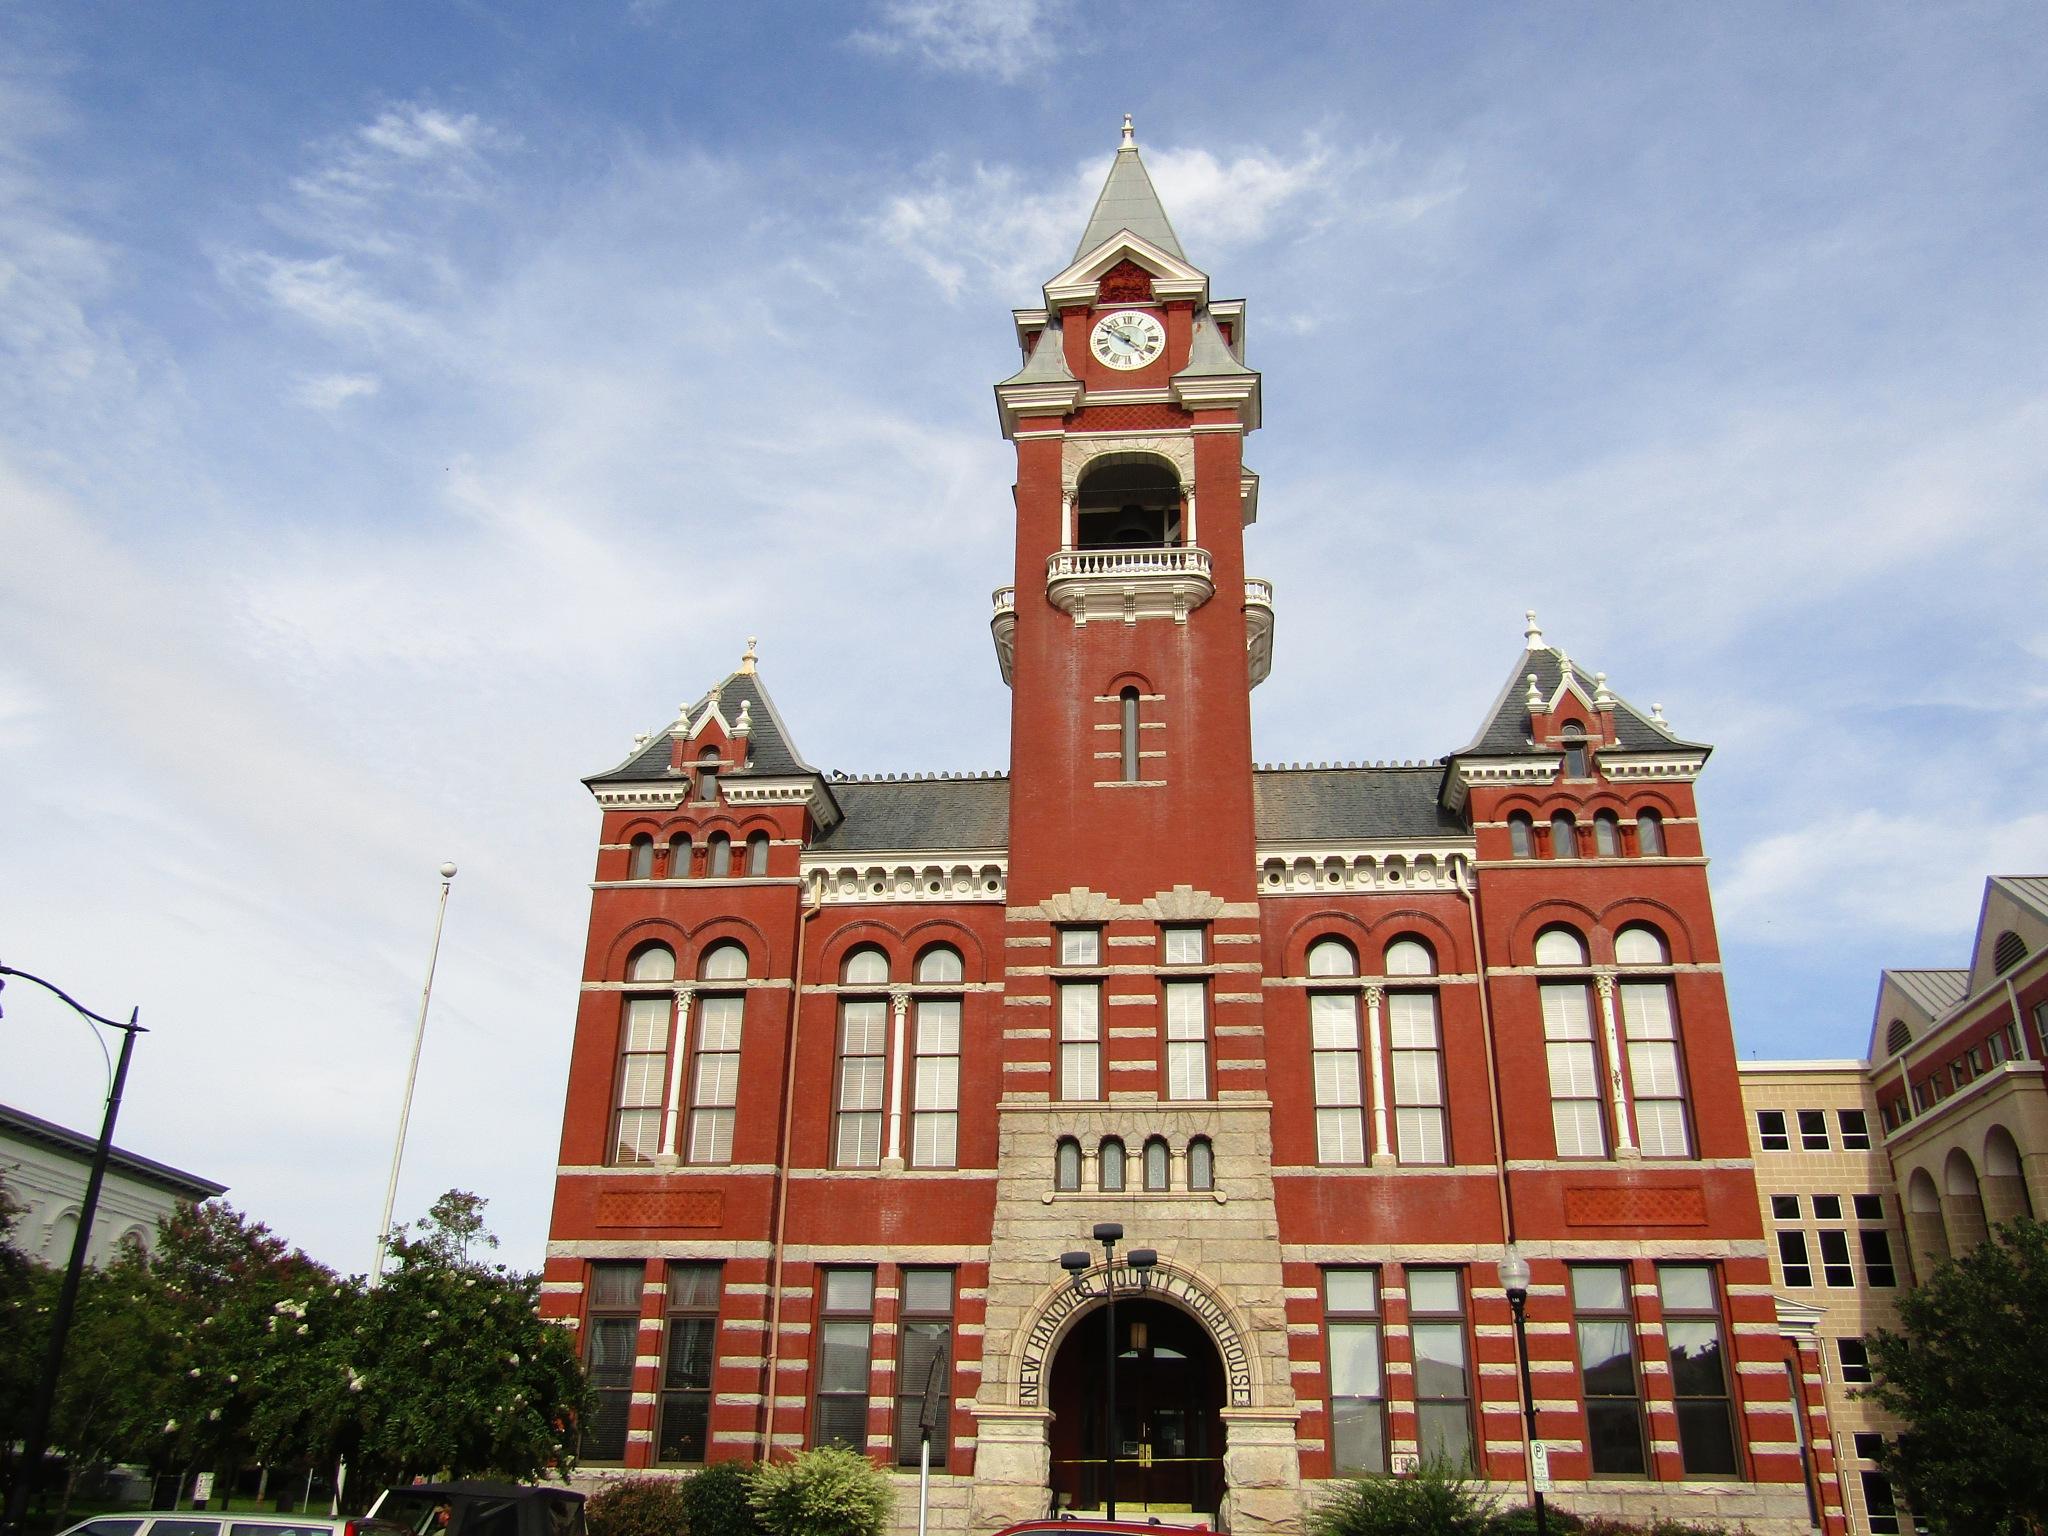 New Hanover County Courthouse by StevenKlabunde